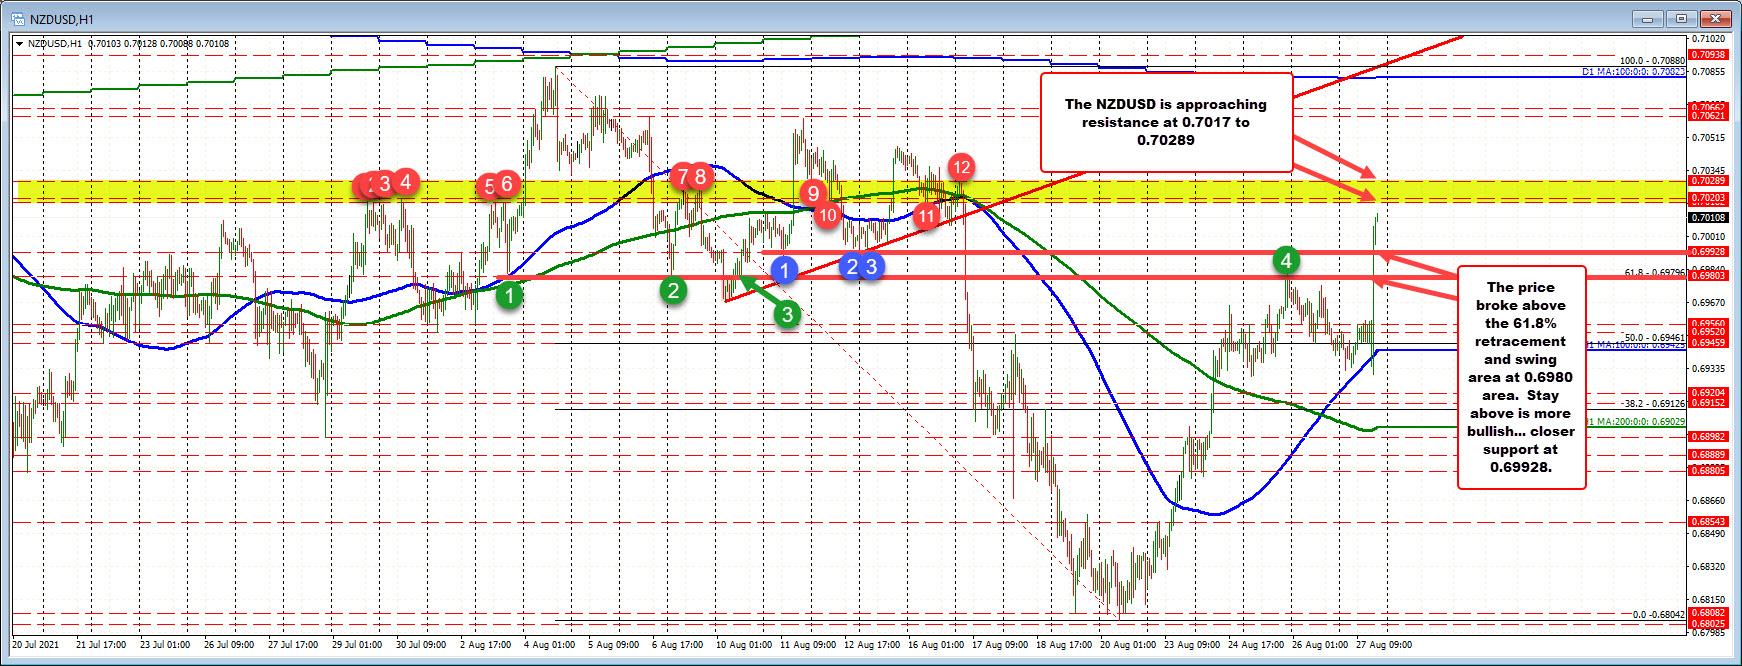 NZDUSD is extending toward the next key swing target area